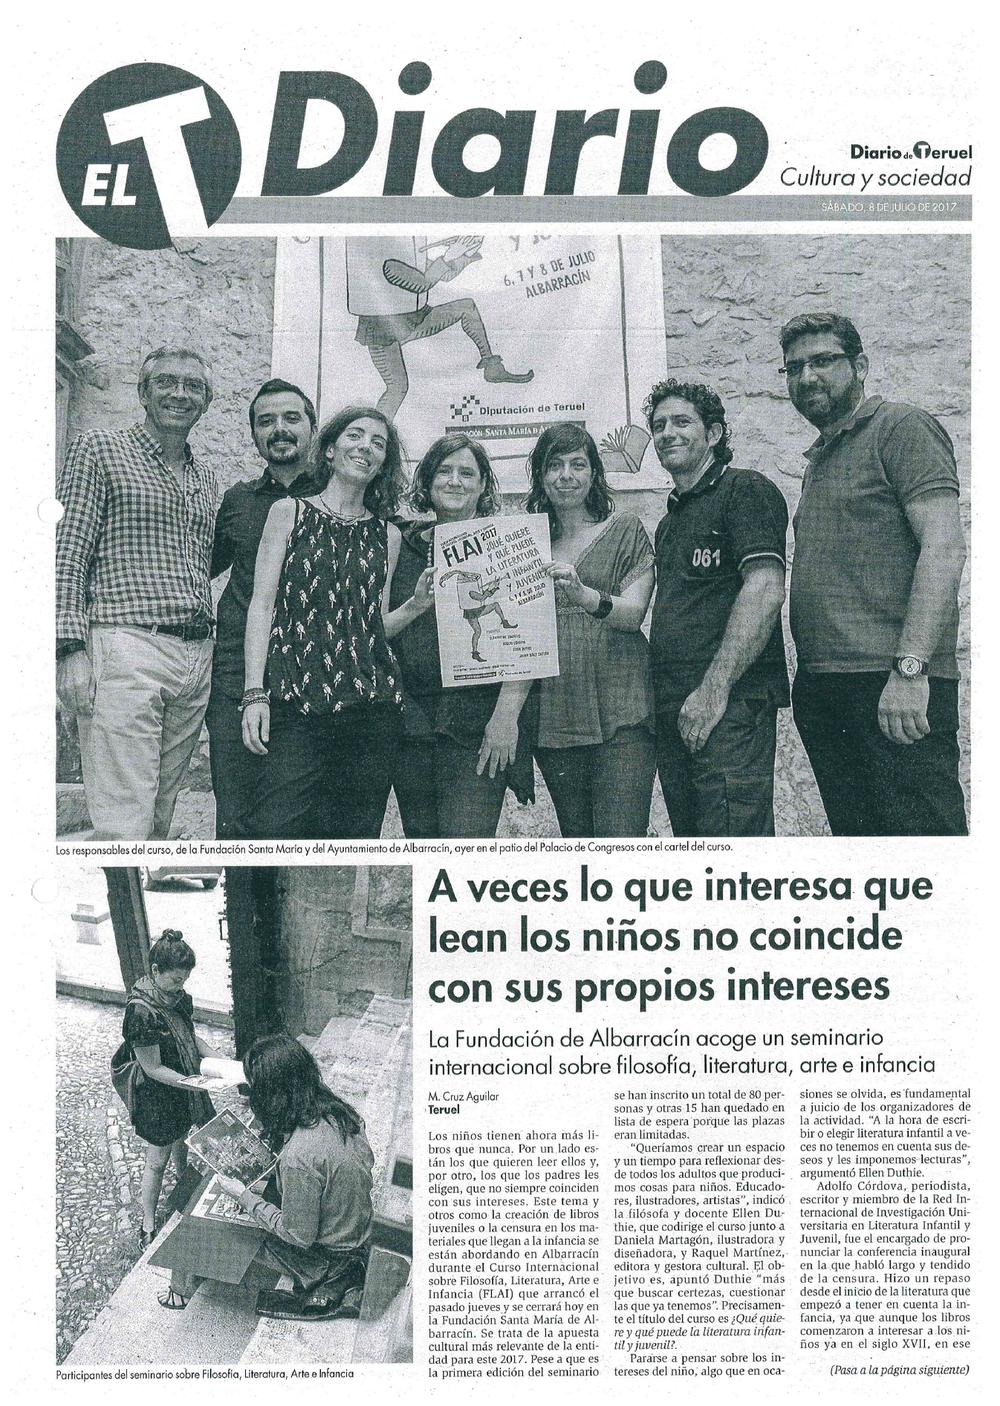 Diario de teruel p1.png